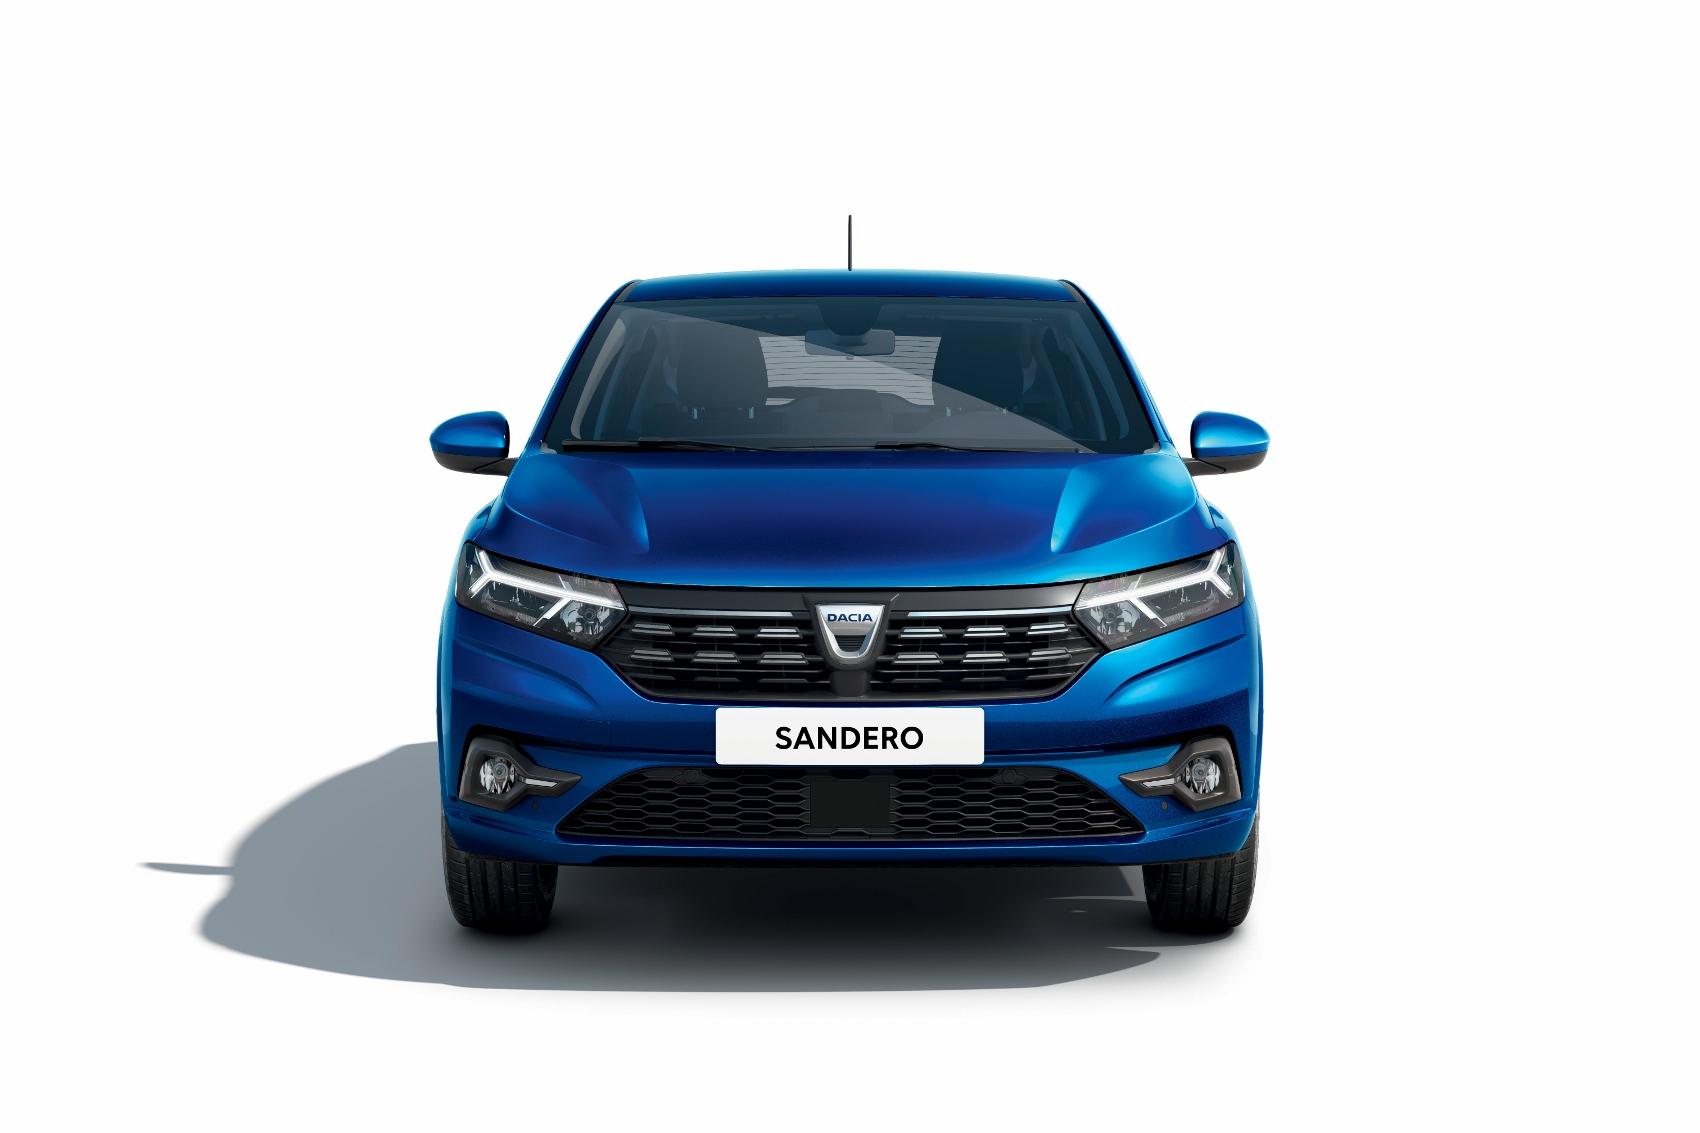 2020 - New Dacia SANDERO (3) (1700x1133)